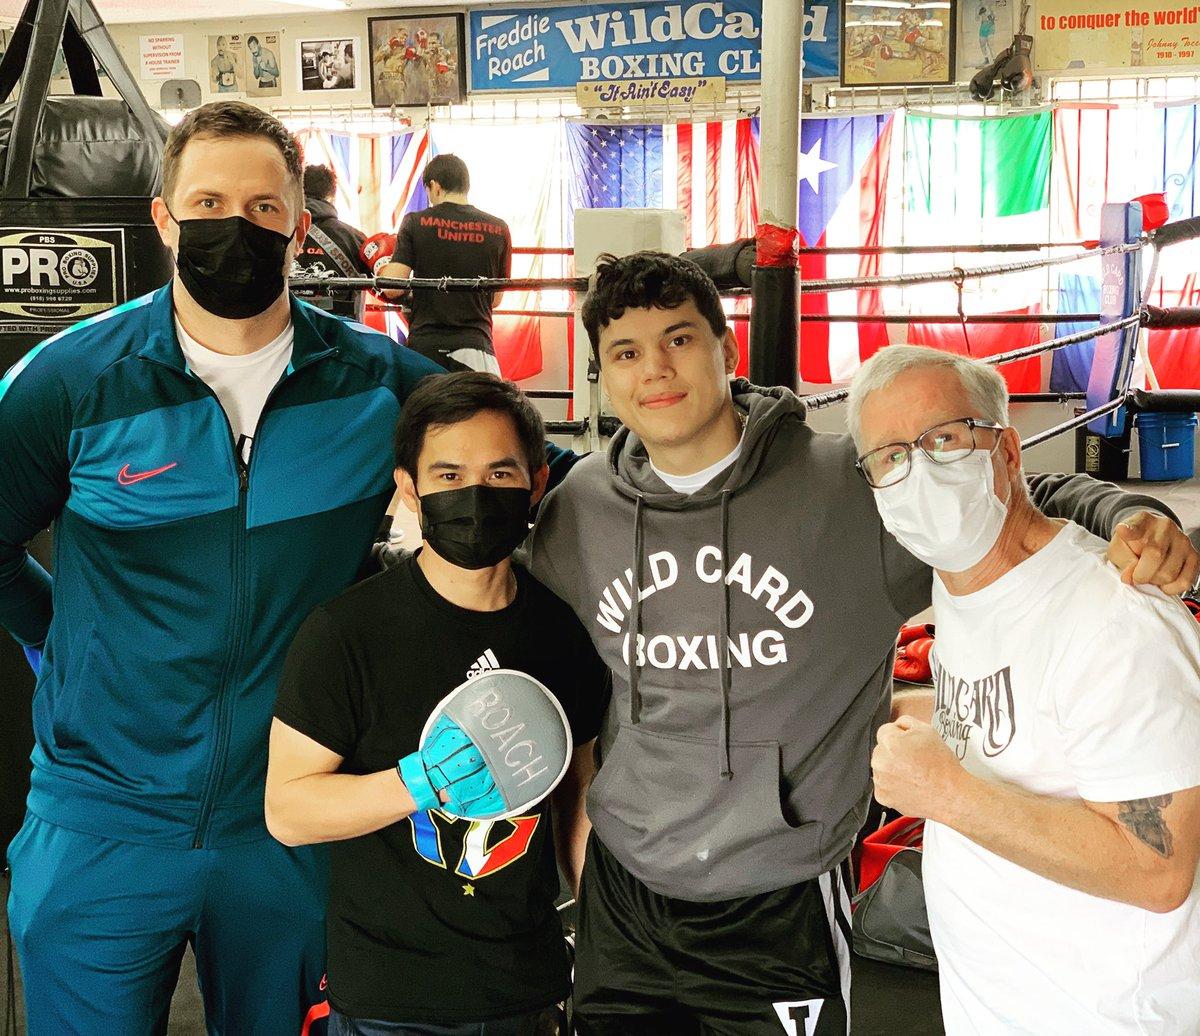 Officially welcoming Oscar Acevedo to my stable of boxers @OscarAce23 @GoldenBoyBoxing #TeamAcevedo @VICIOUSortiz @WildCardBoxing1 #MarvinSomodio #DonatasJanusevicius @WCBstore @Everlast_ @eaner0919 #wildcardboxing #wildcardboxingclub #boxer #fighter #boxing #training https://t.co/inWbDPLdEh